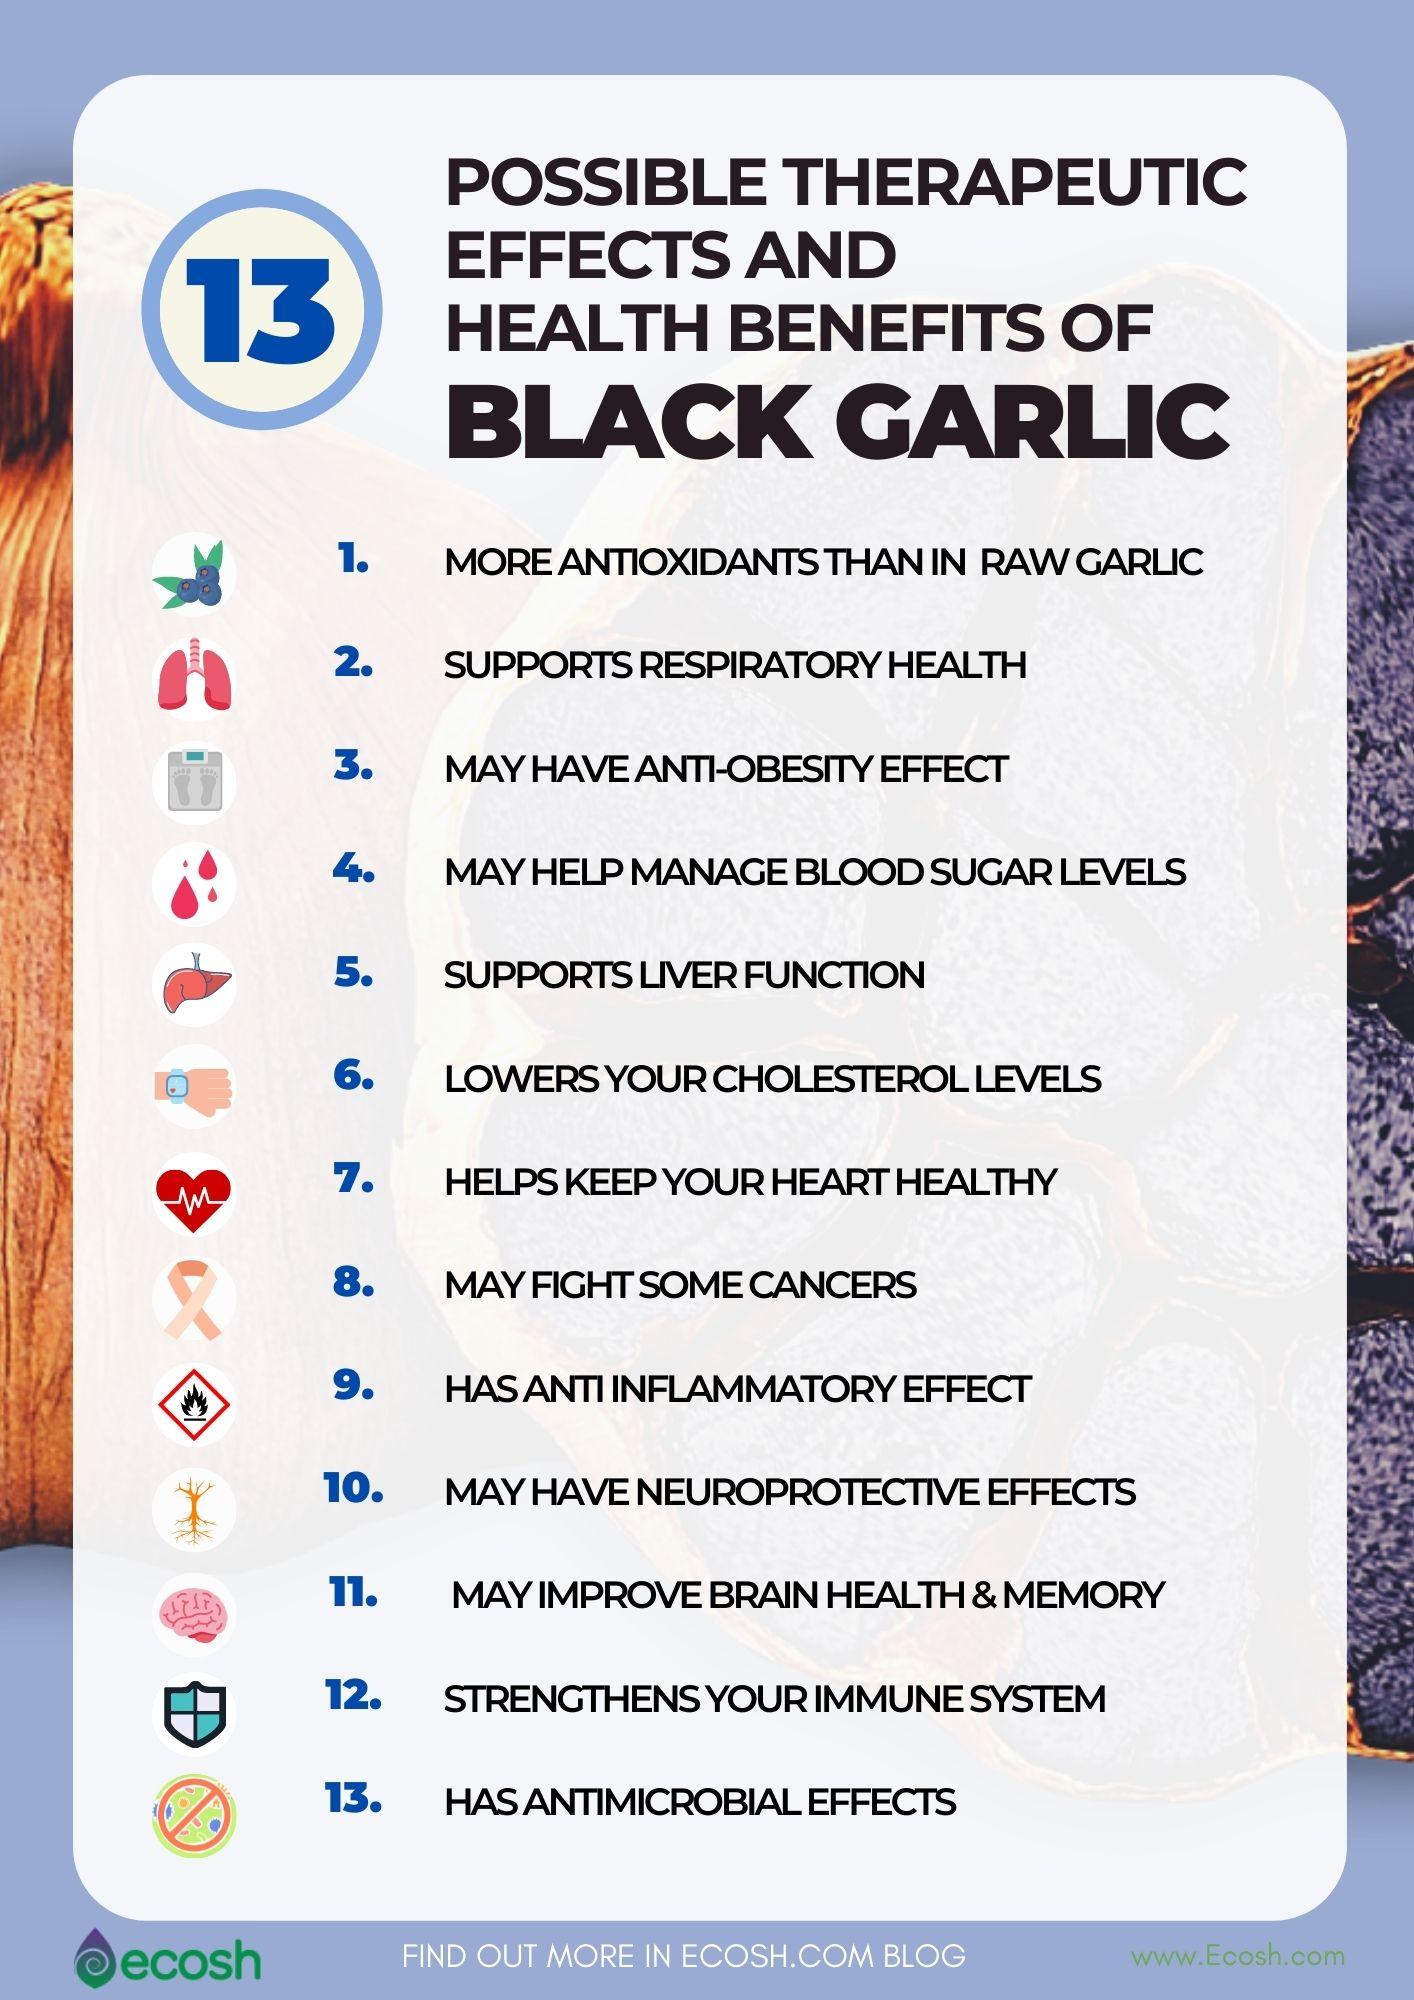 Black_Garlic_Health_Benefits_Black_Garlic_and_Cancer_13_Health_Benefits_of_Black_Garlic_Therapeutic_Effects_of_Black_Garlic_Black_Garlic_and_Inflammation_